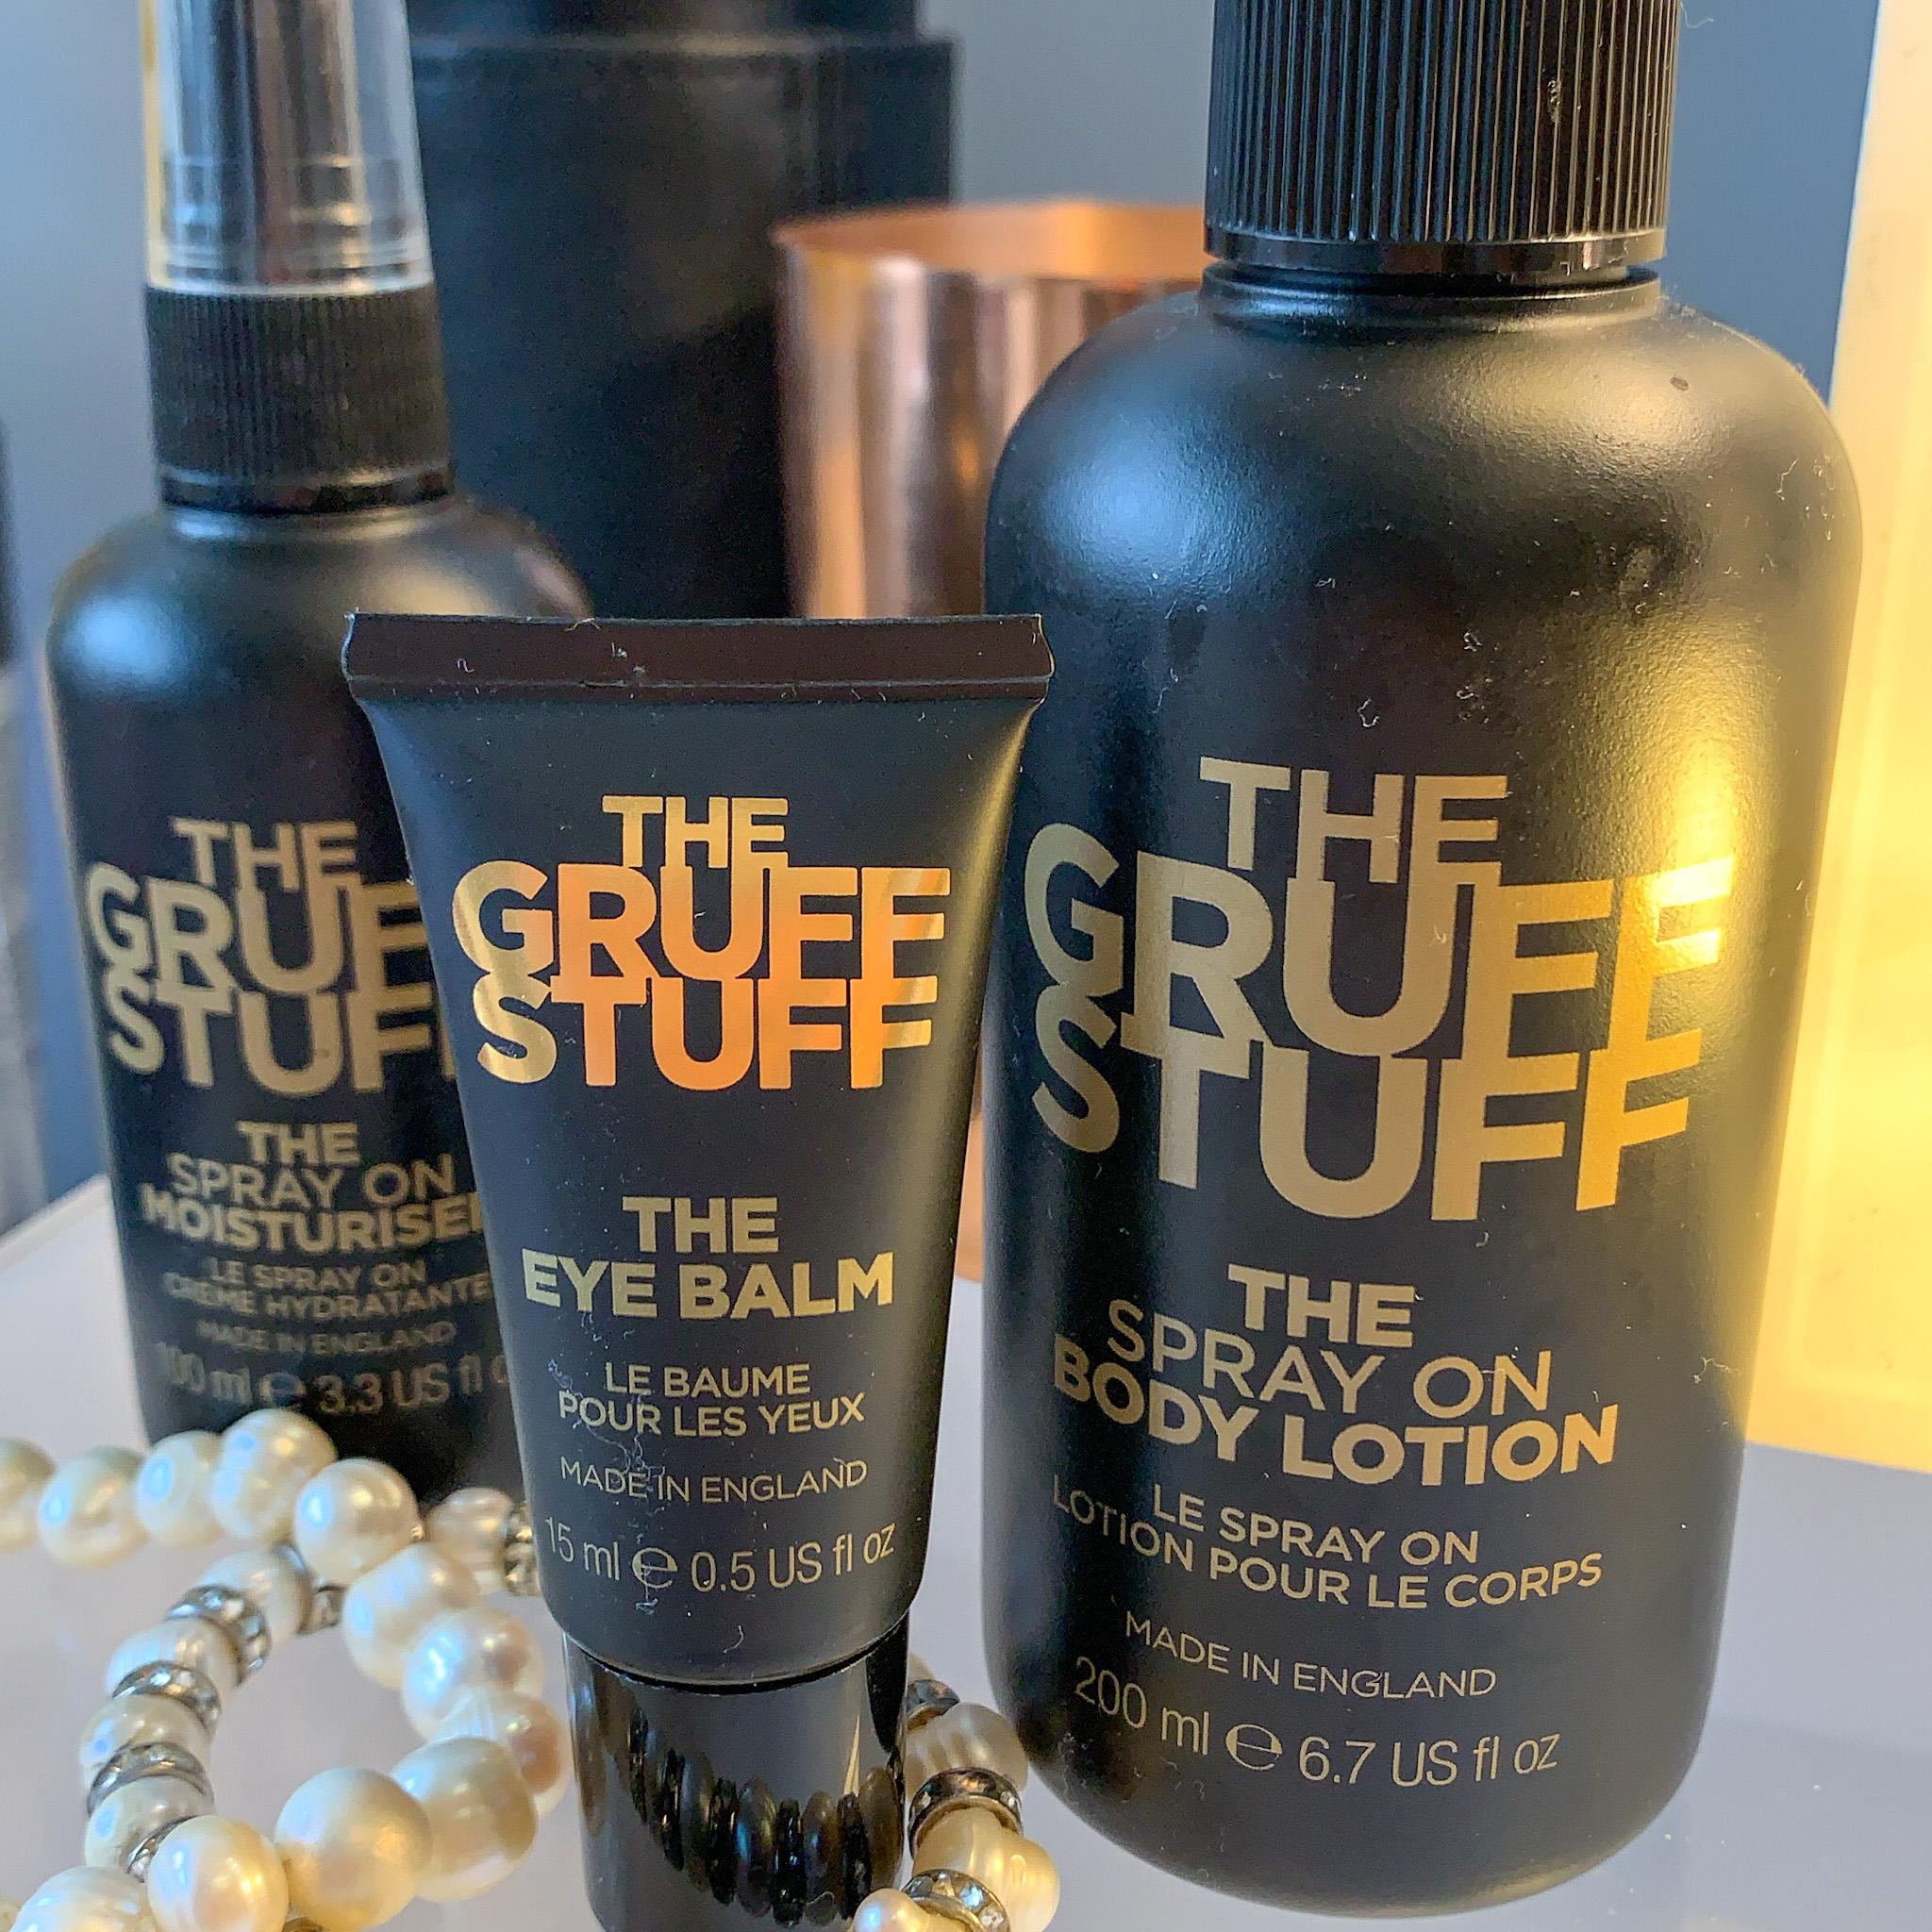 A review of men's, premium & cruelty free skincare brand The Gruff Stuff.